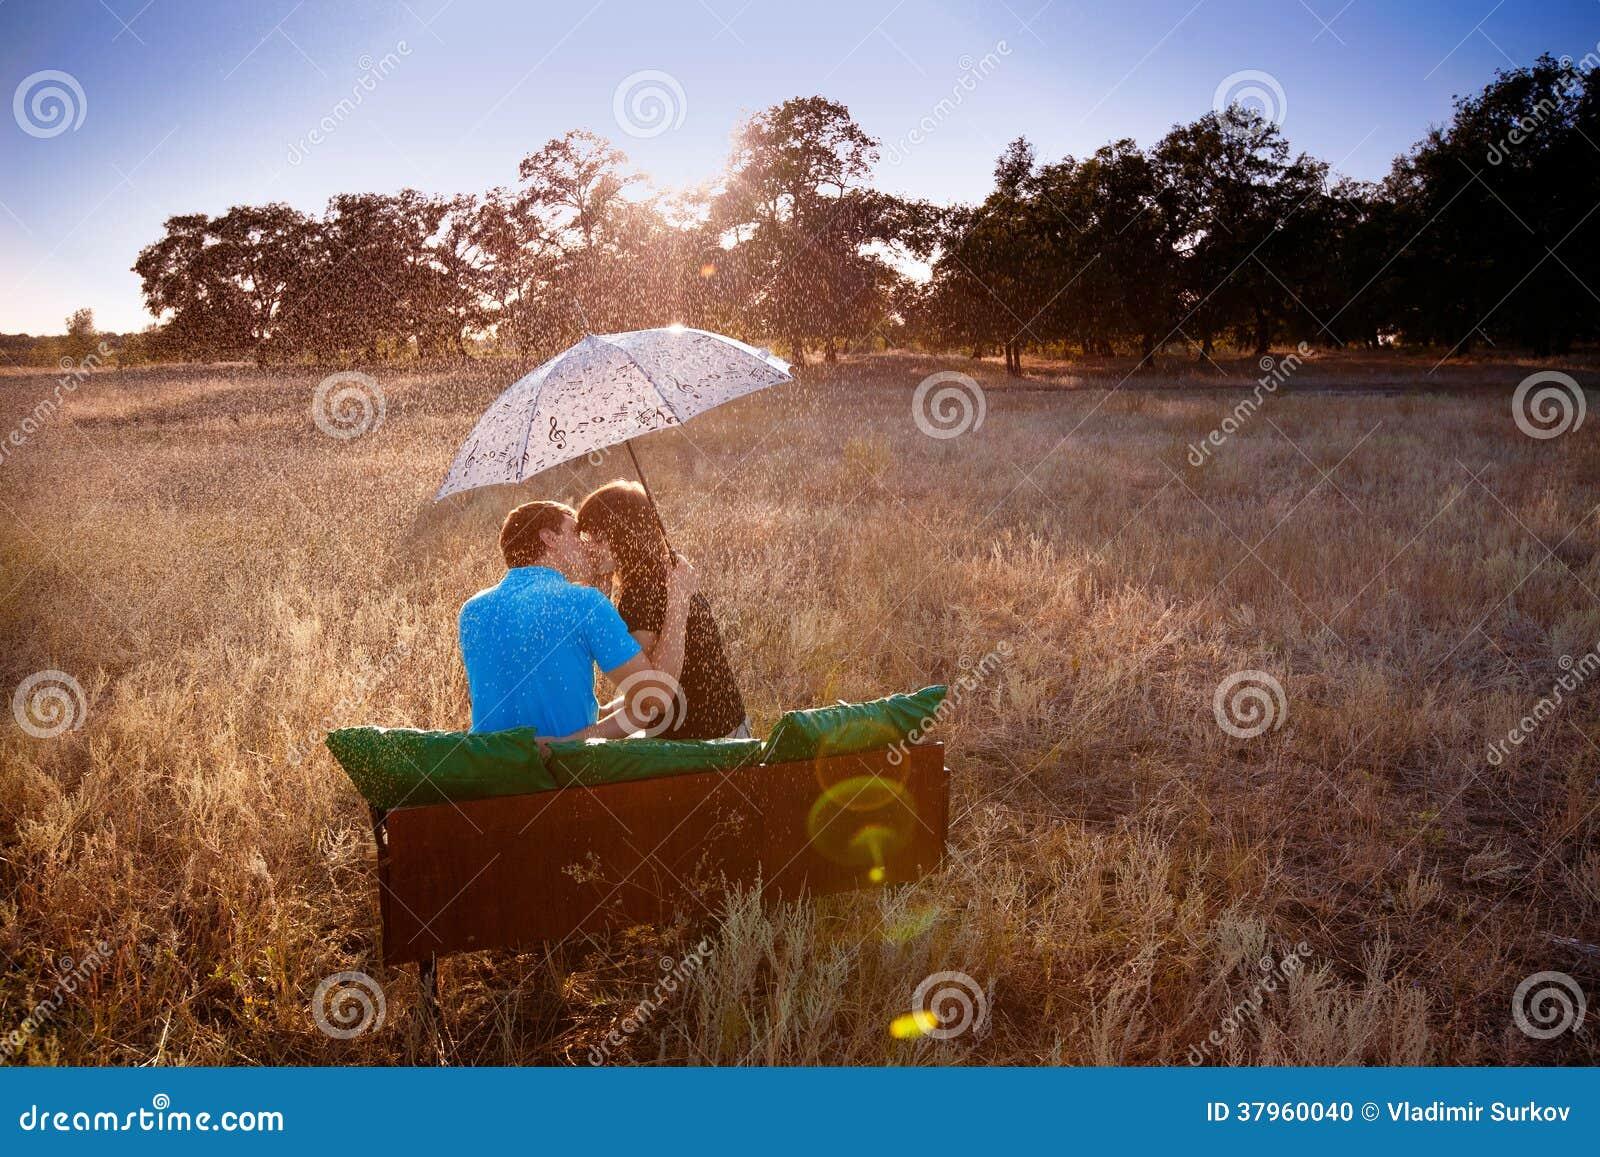 Love Under The Rain Stock Photo - Image: 37960040